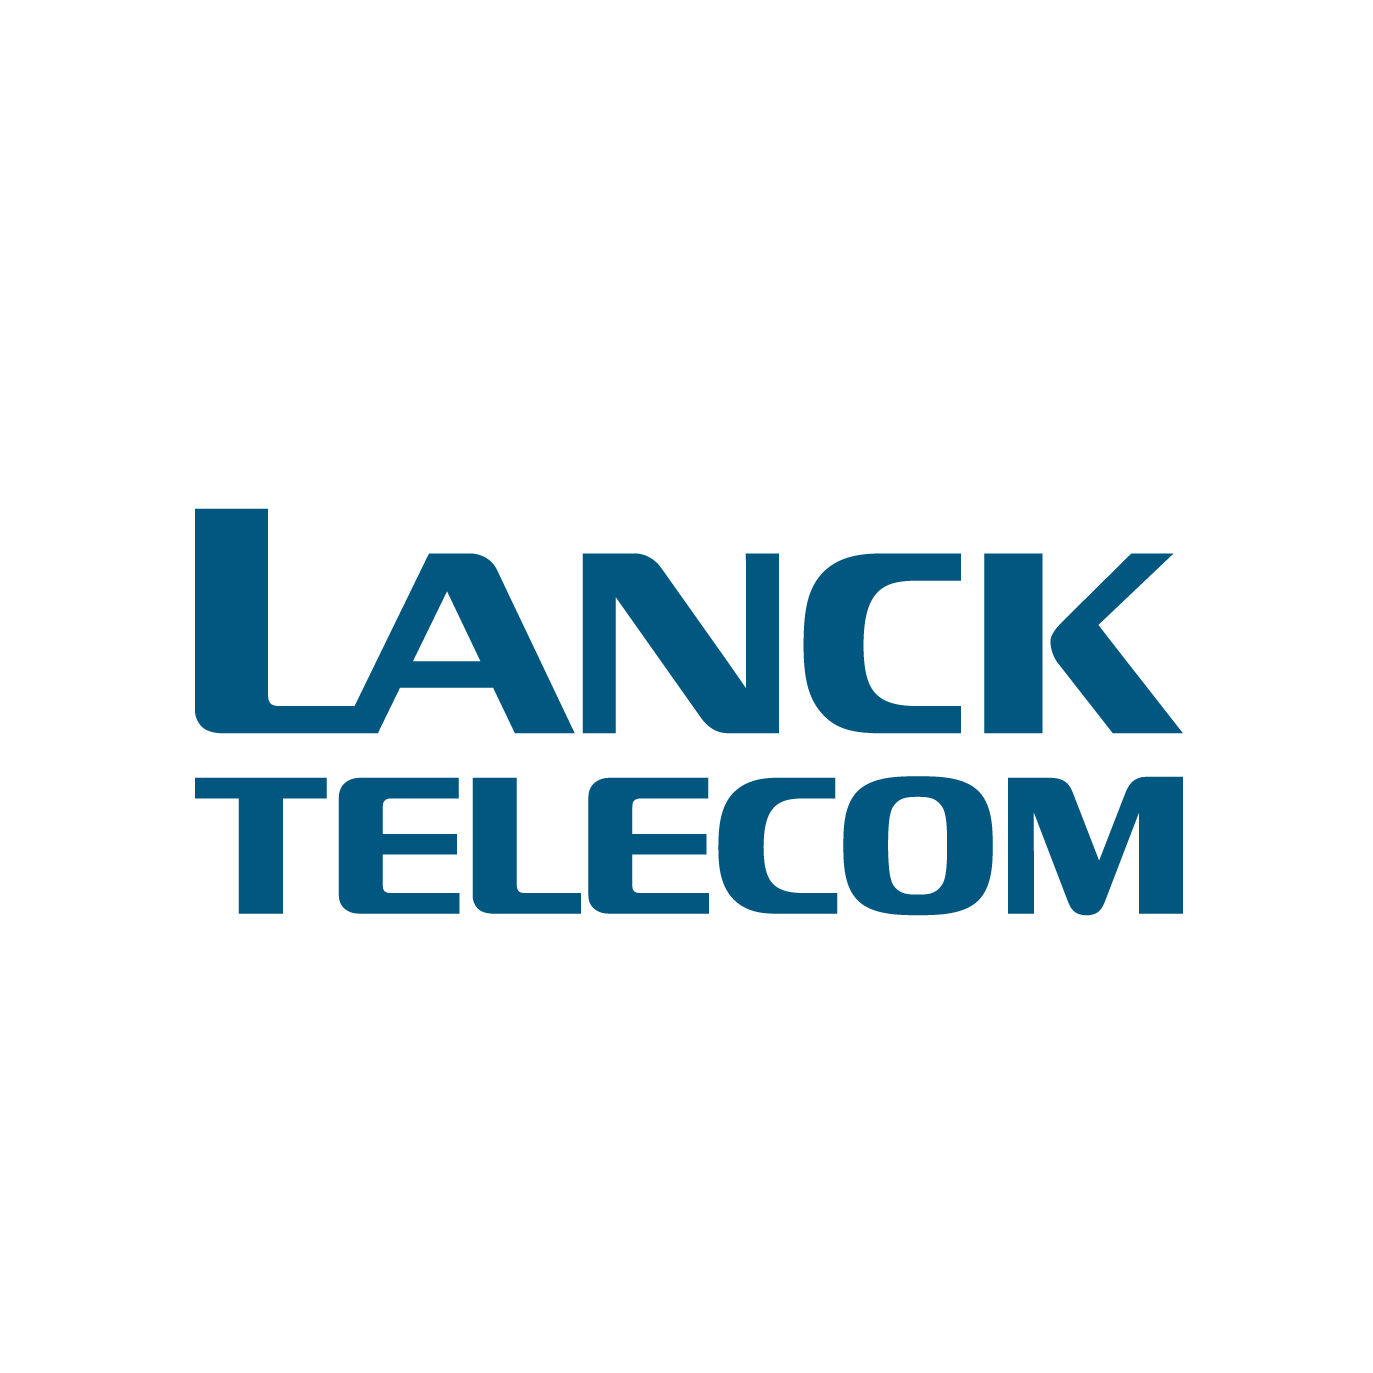 Логотип компании «Lanck Telecom»